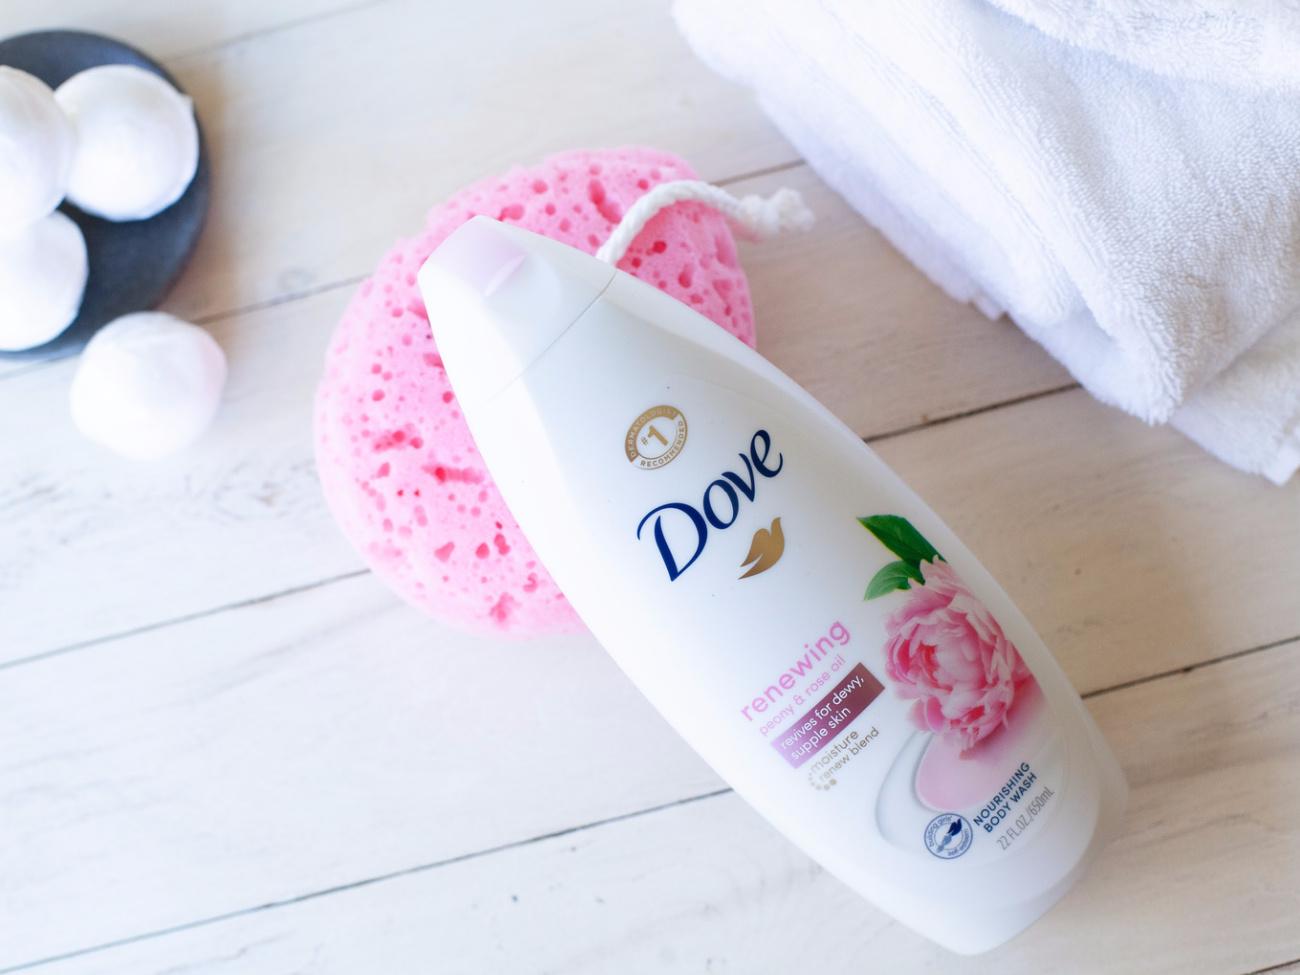 Dove Body Wash Just $3.79 At Publix on I Heart Publix